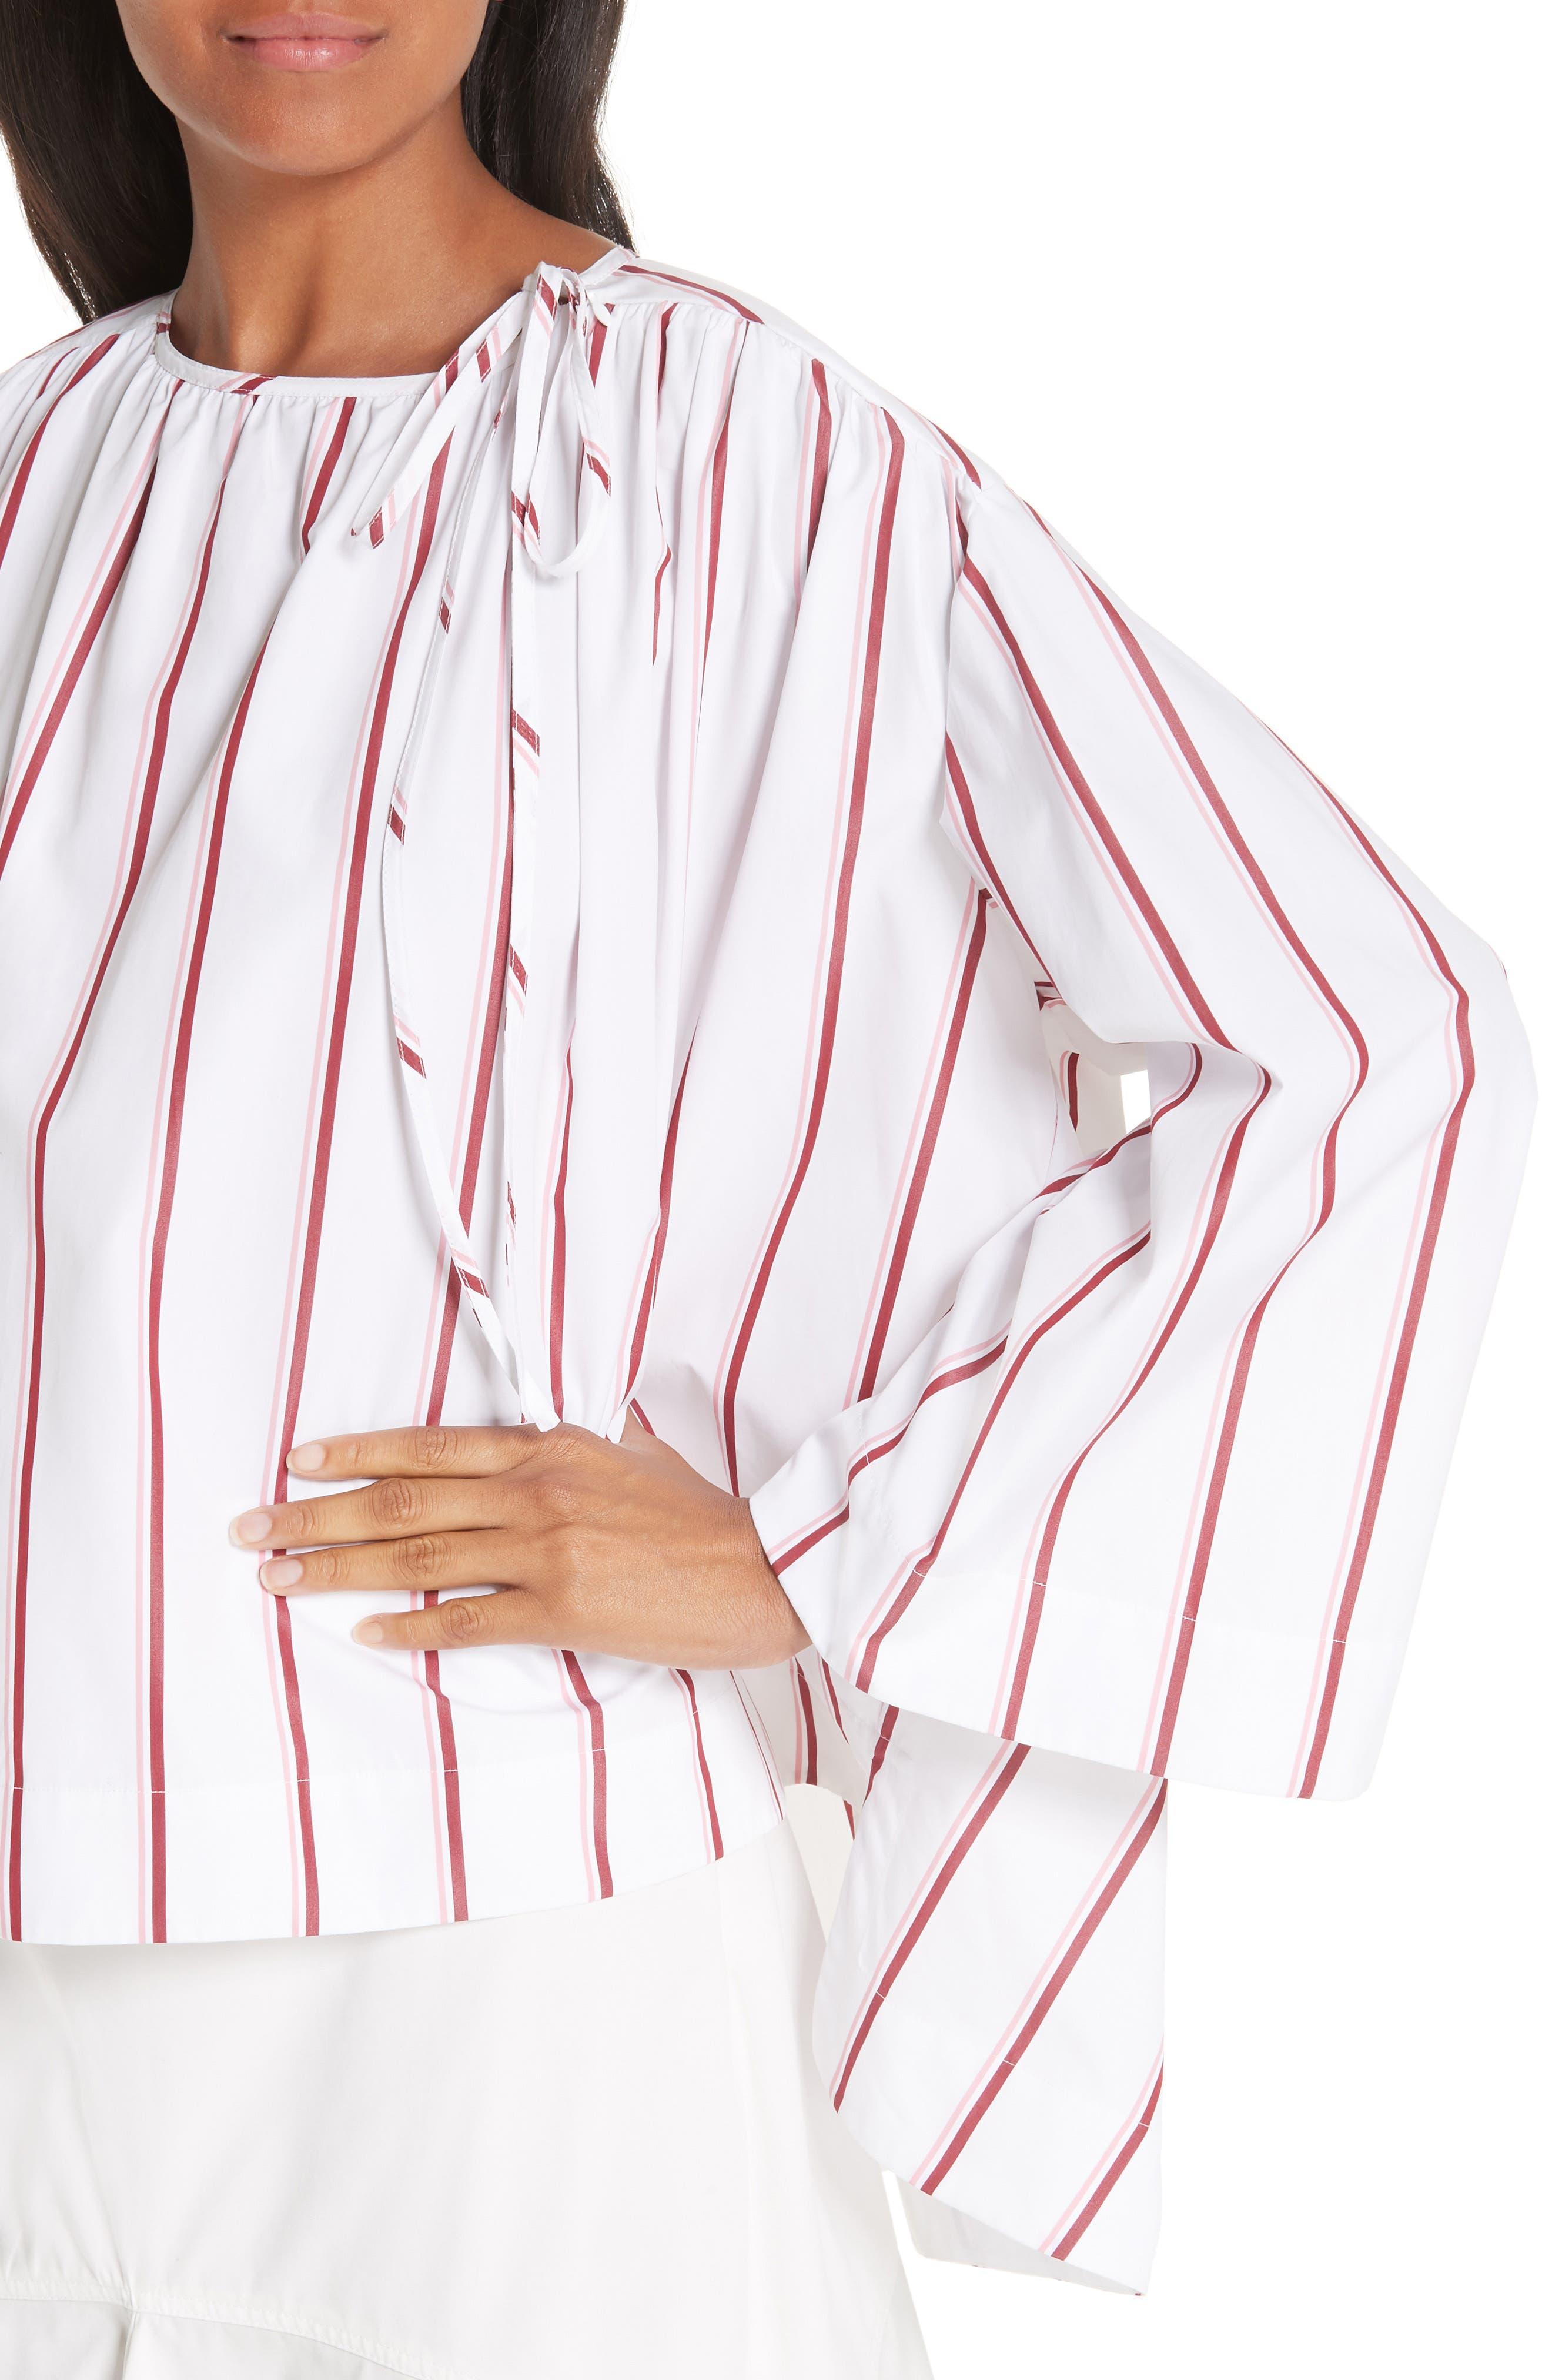 CALVIN KLEIN 205W39NYC, Tie Neck Cotton Poplin Blouse, Alternate thumbnail 5, color, OPTIC WHITE CAMEO PINK